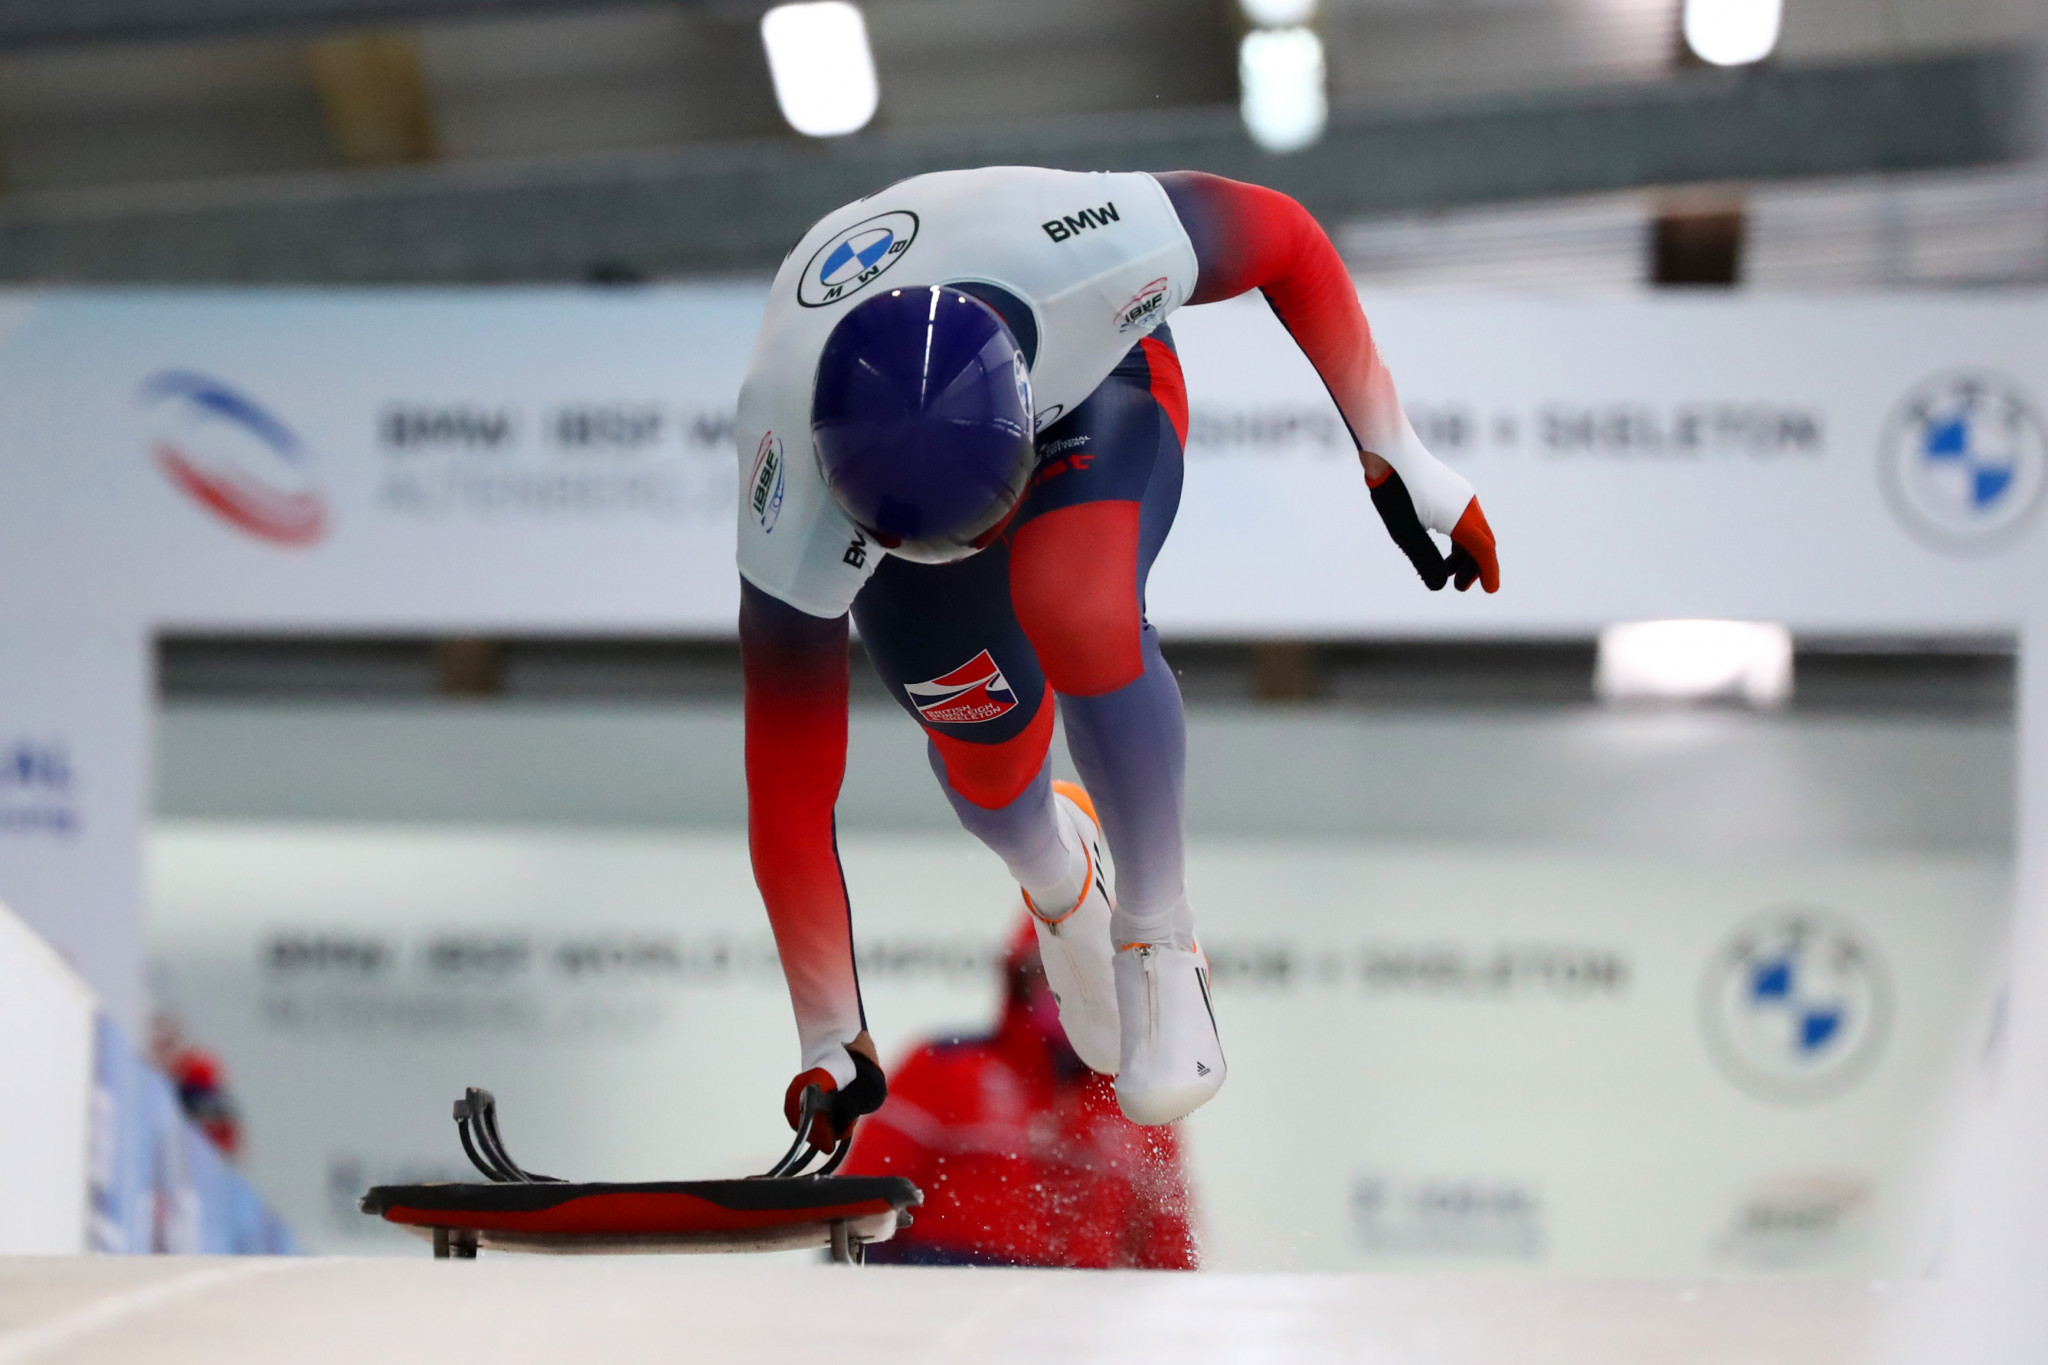 Potential British Olympians begin training to emulate skeleton success at Milan Cortina 2026